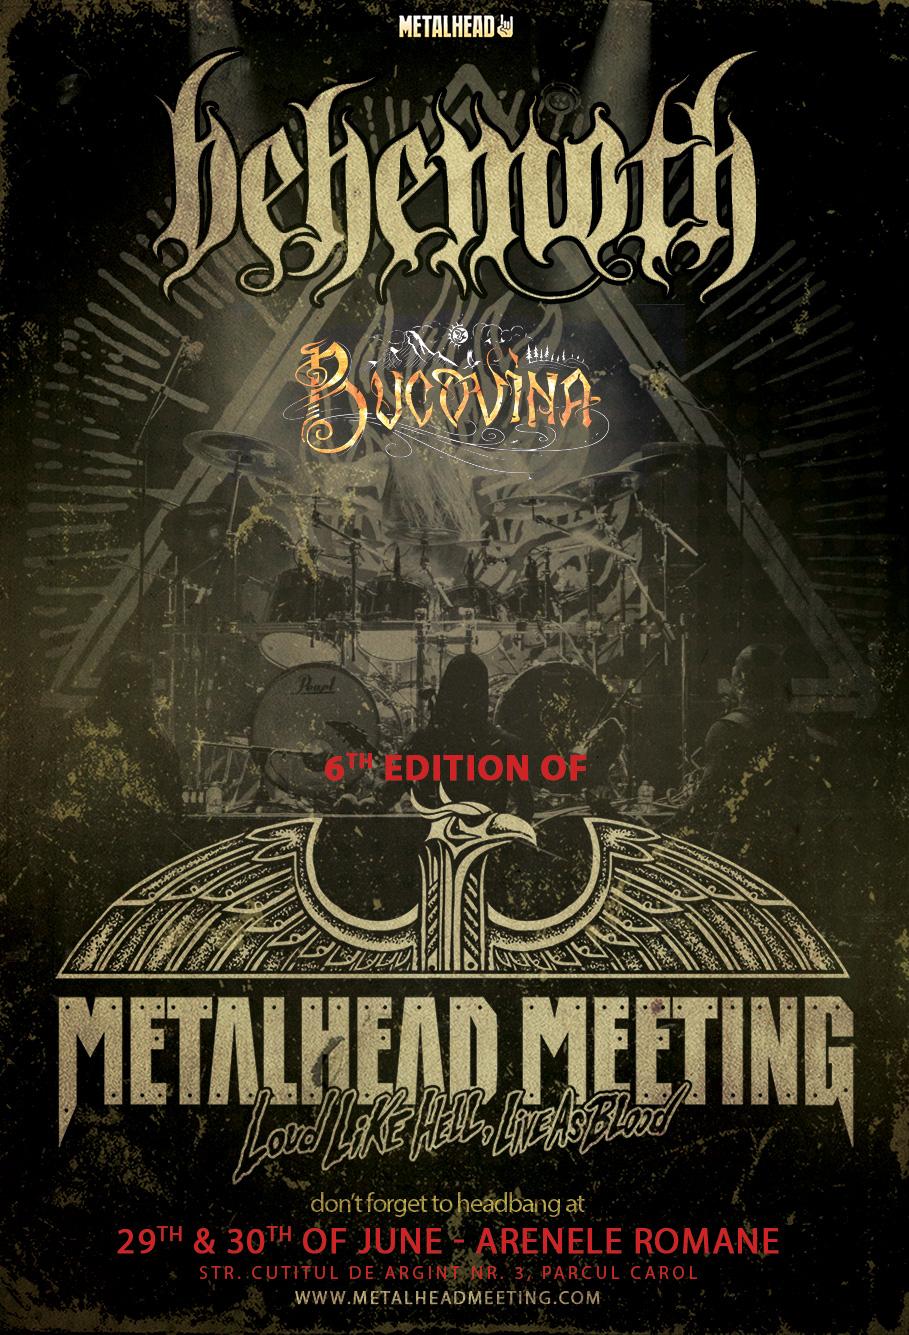 METALHEAD Meeting 2017: BEHEMOTH si Bucovina, primele doua nume confirmate